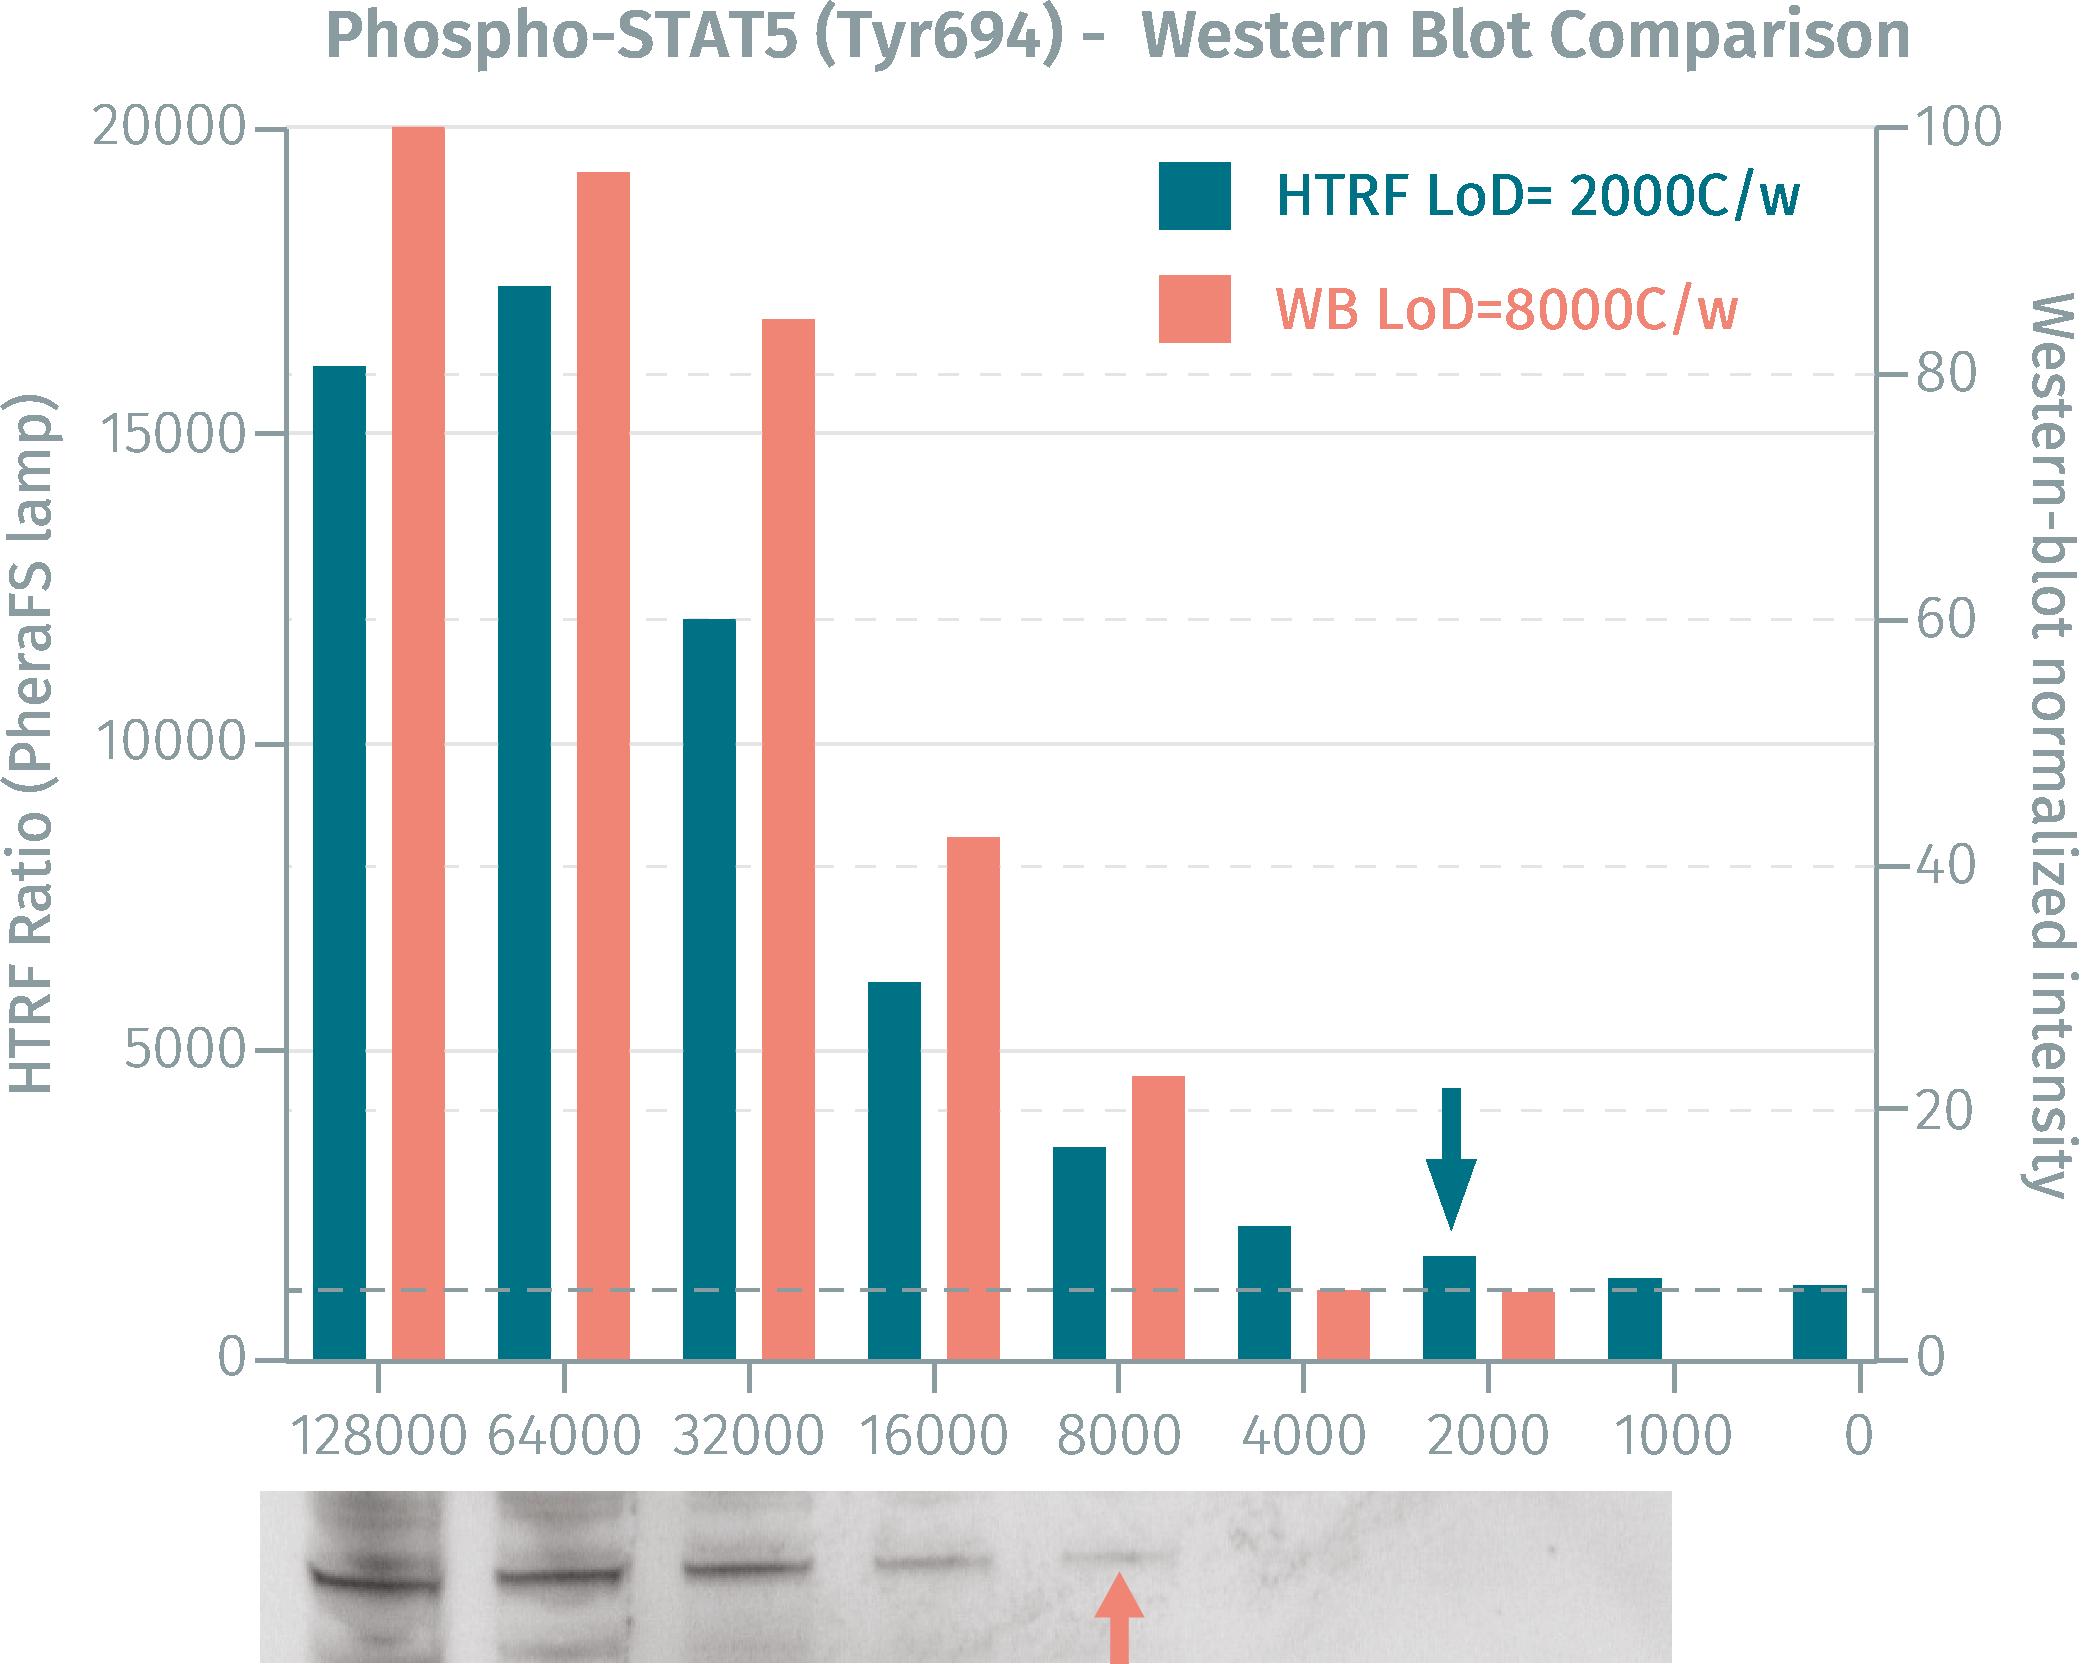 phospho-STAT5 (Tyr694) -Western Blot Comparison